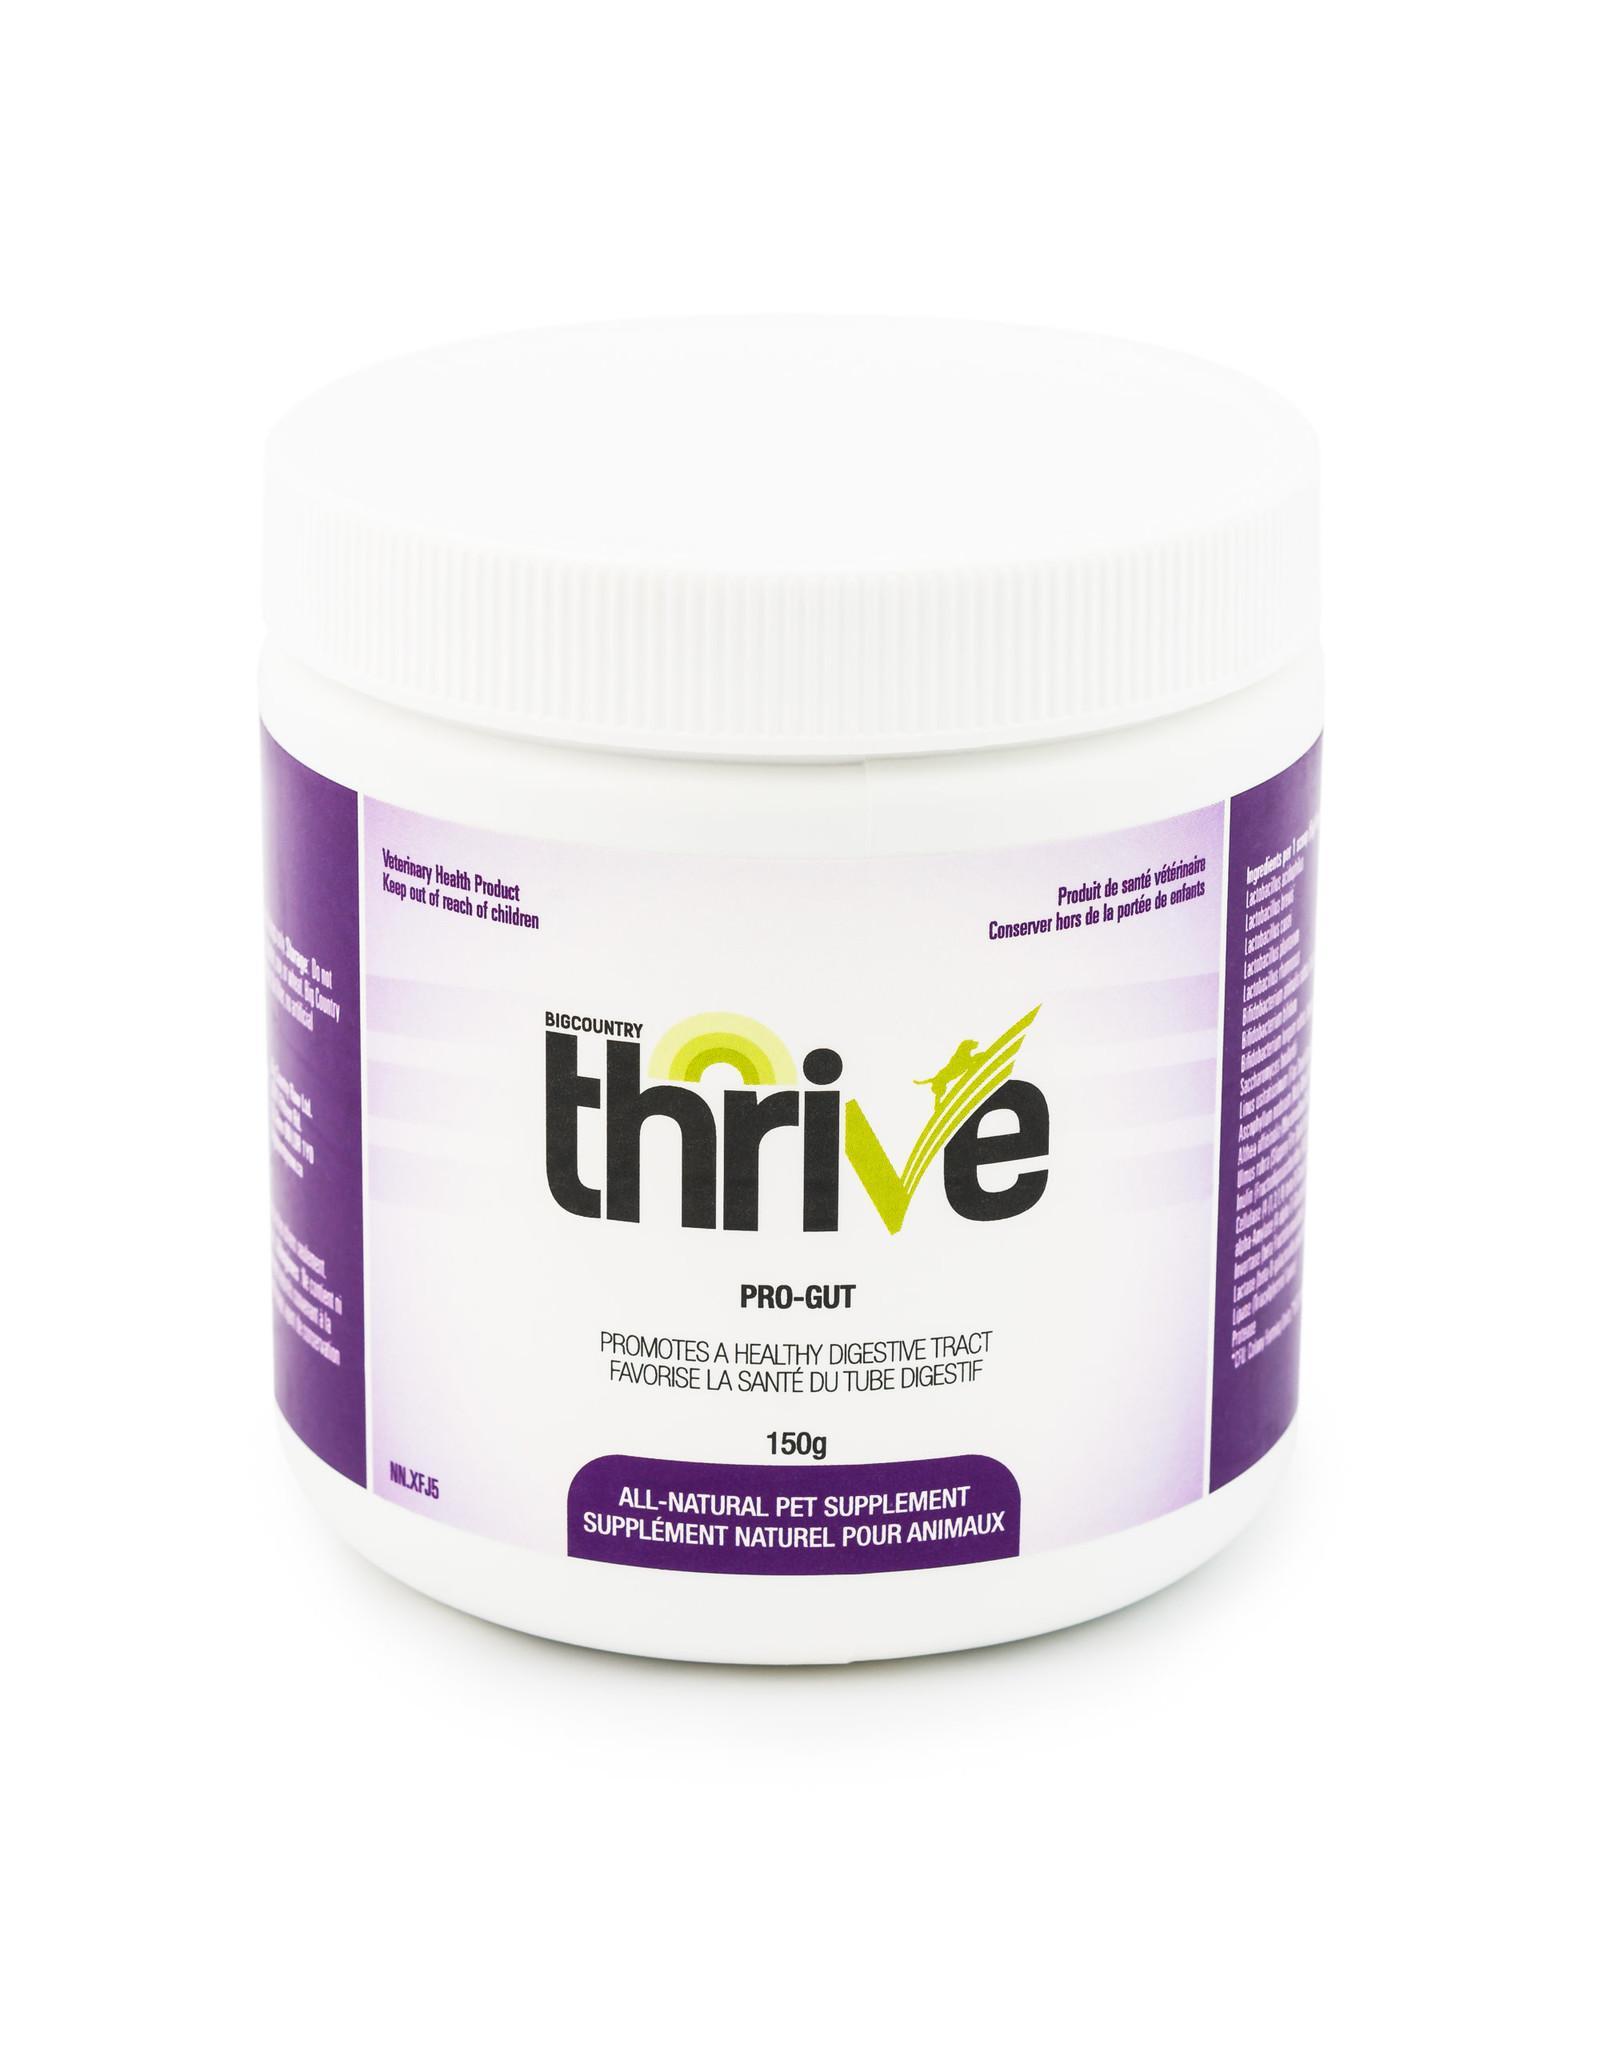 Thrive ProGut Dog & Cat Supplement, 150-gram